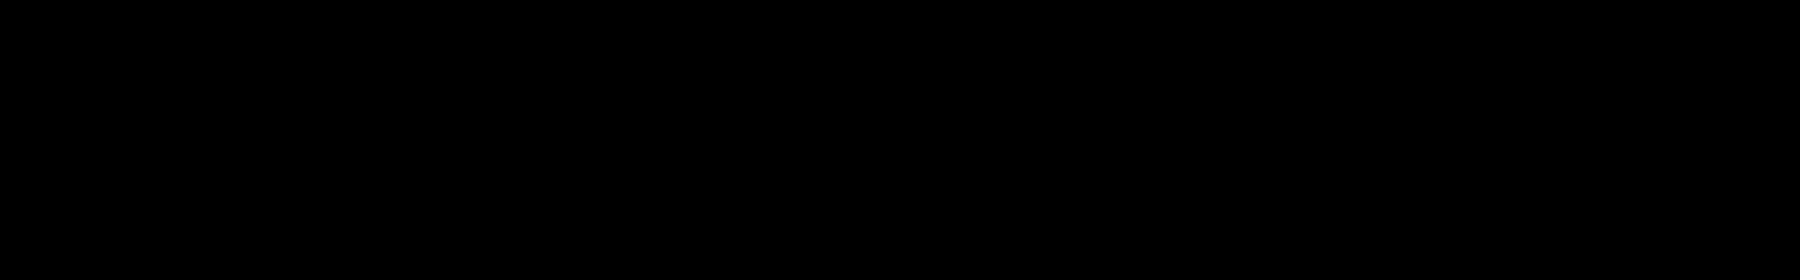 MYSTXRIVL x Enjoii - Signature Sounds Vol.1 audio waveform